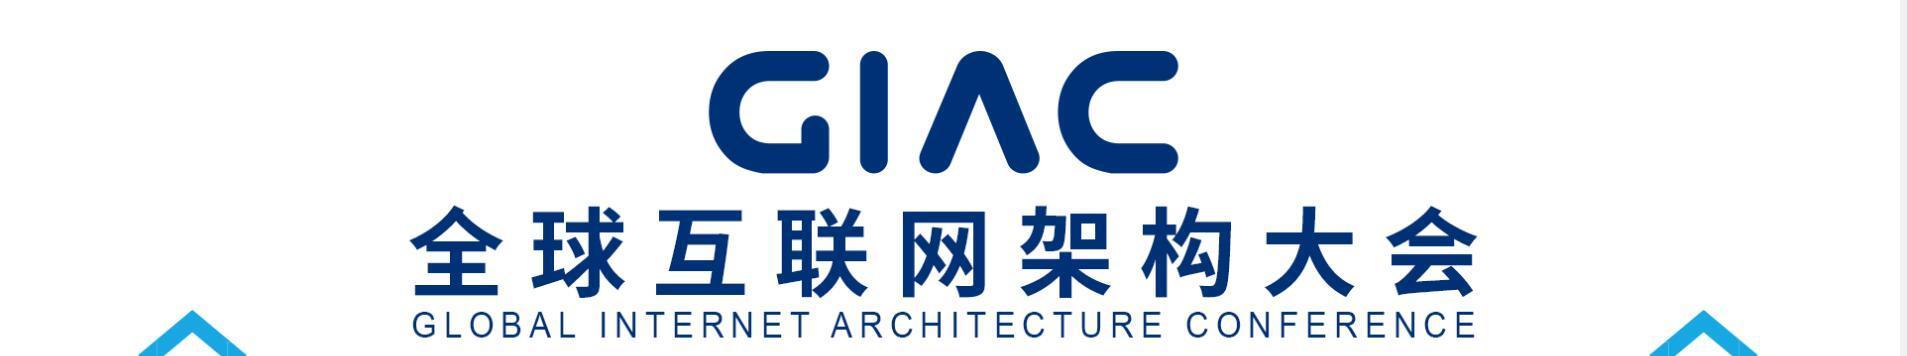 2020 GIAC全球互聯網架構大會